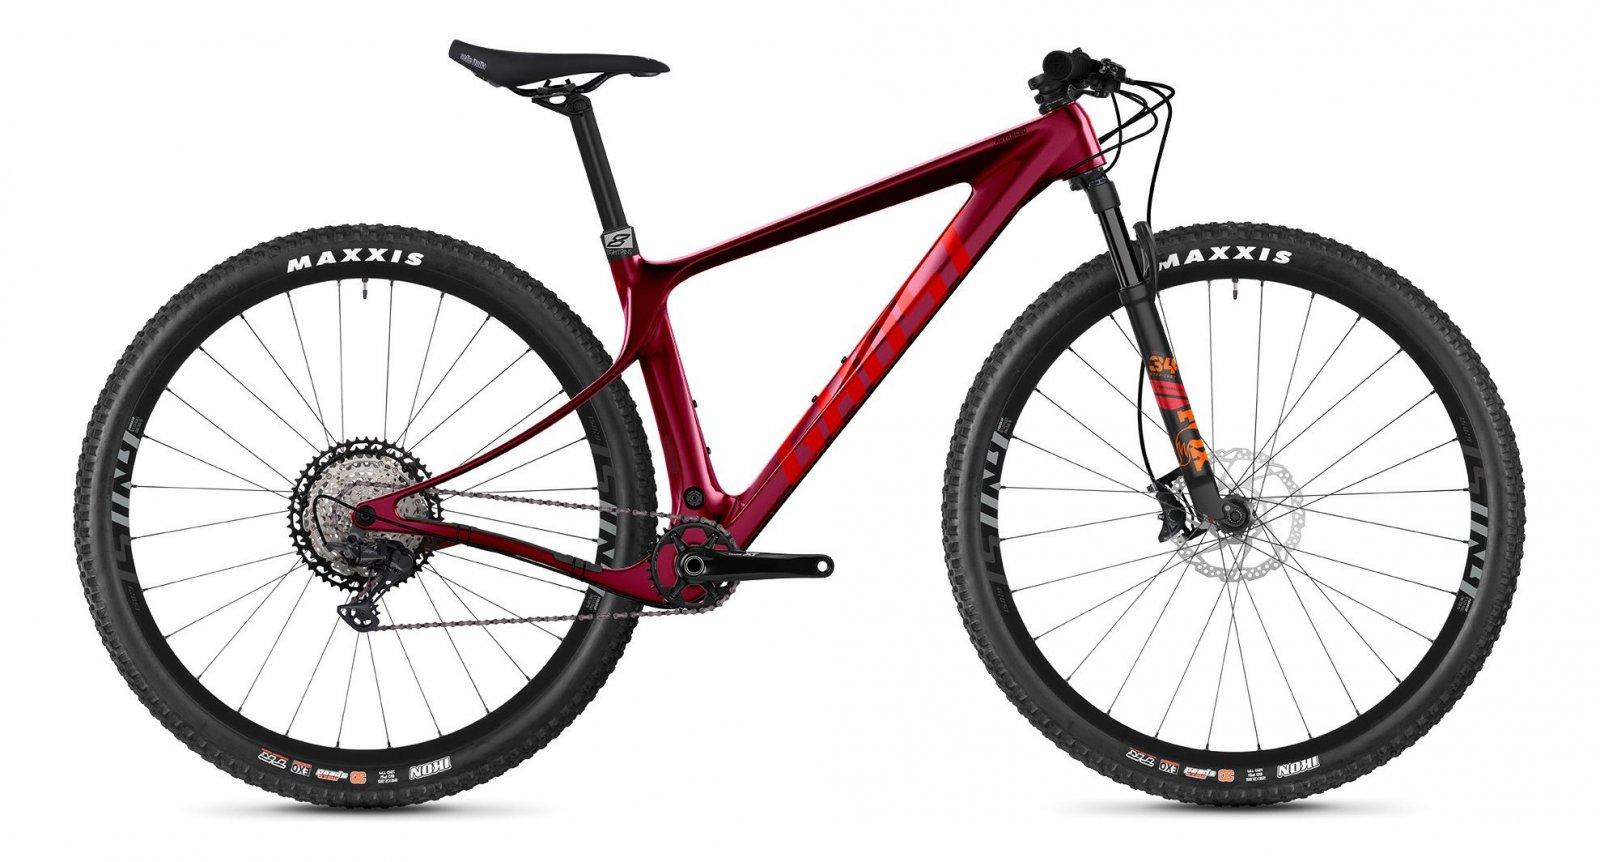 Ghost-lector_sf_lc_advanced-_mountain_bike-2021-02.jpg